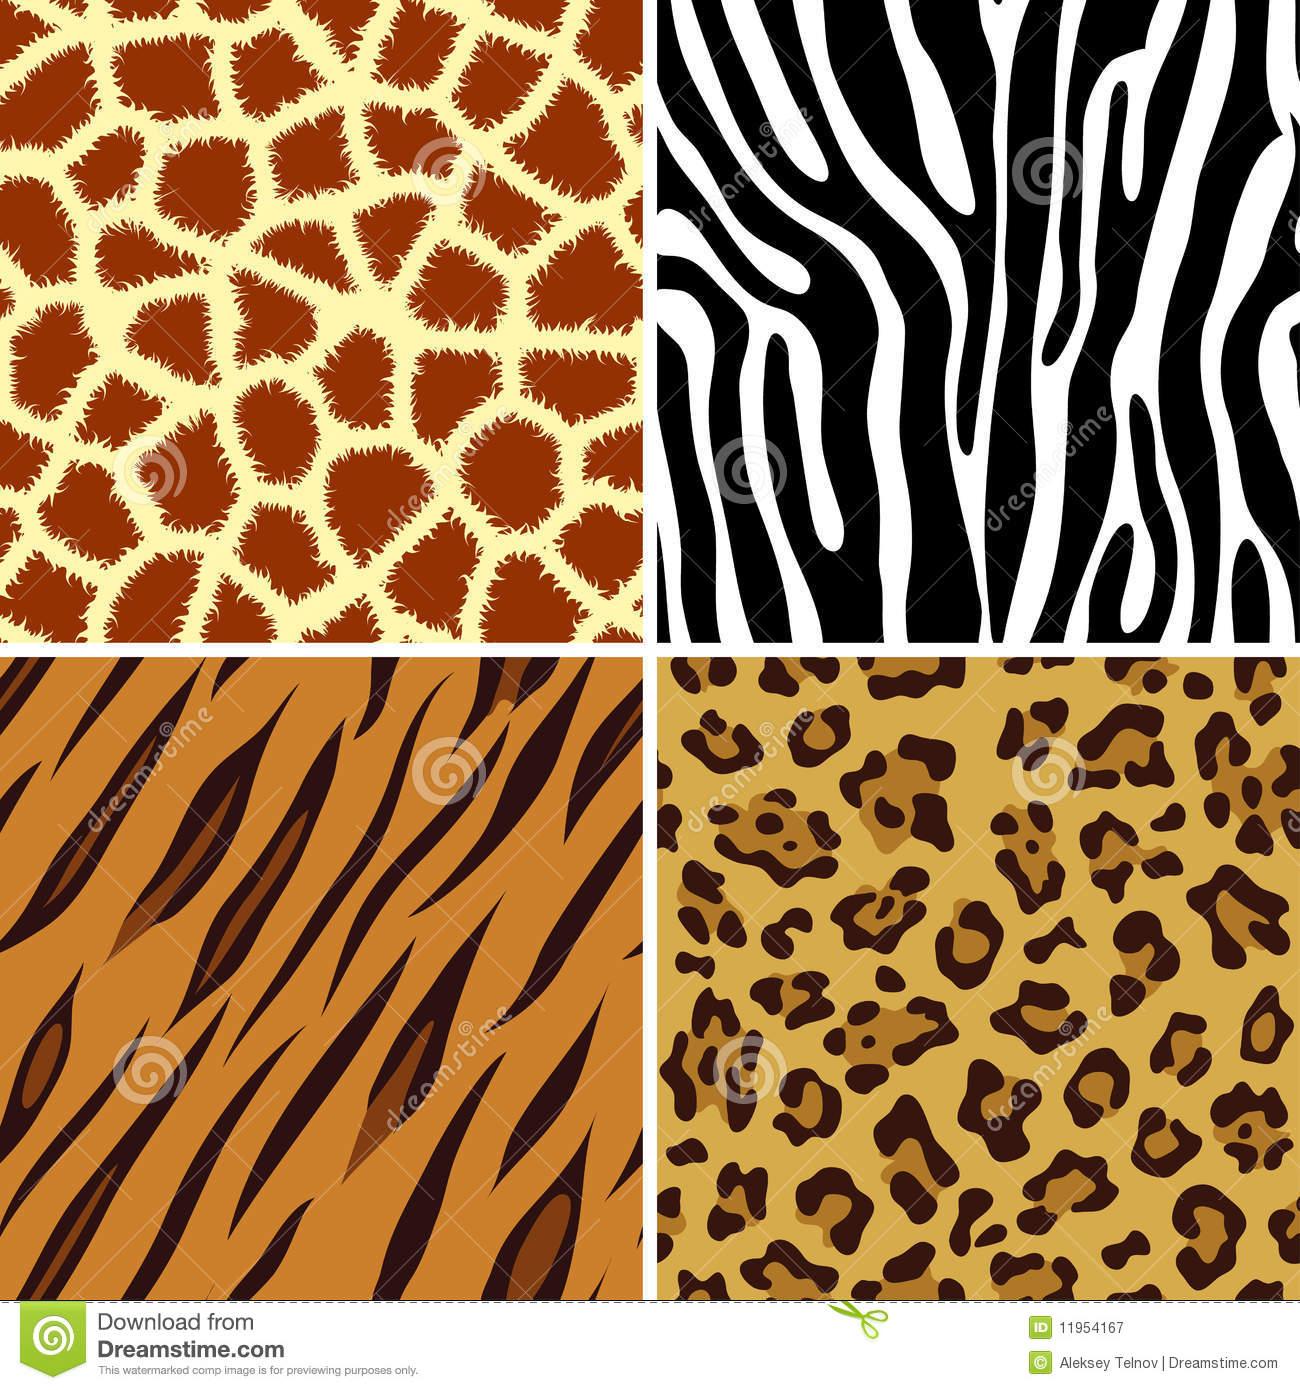 Leopard Stock Illustrations.